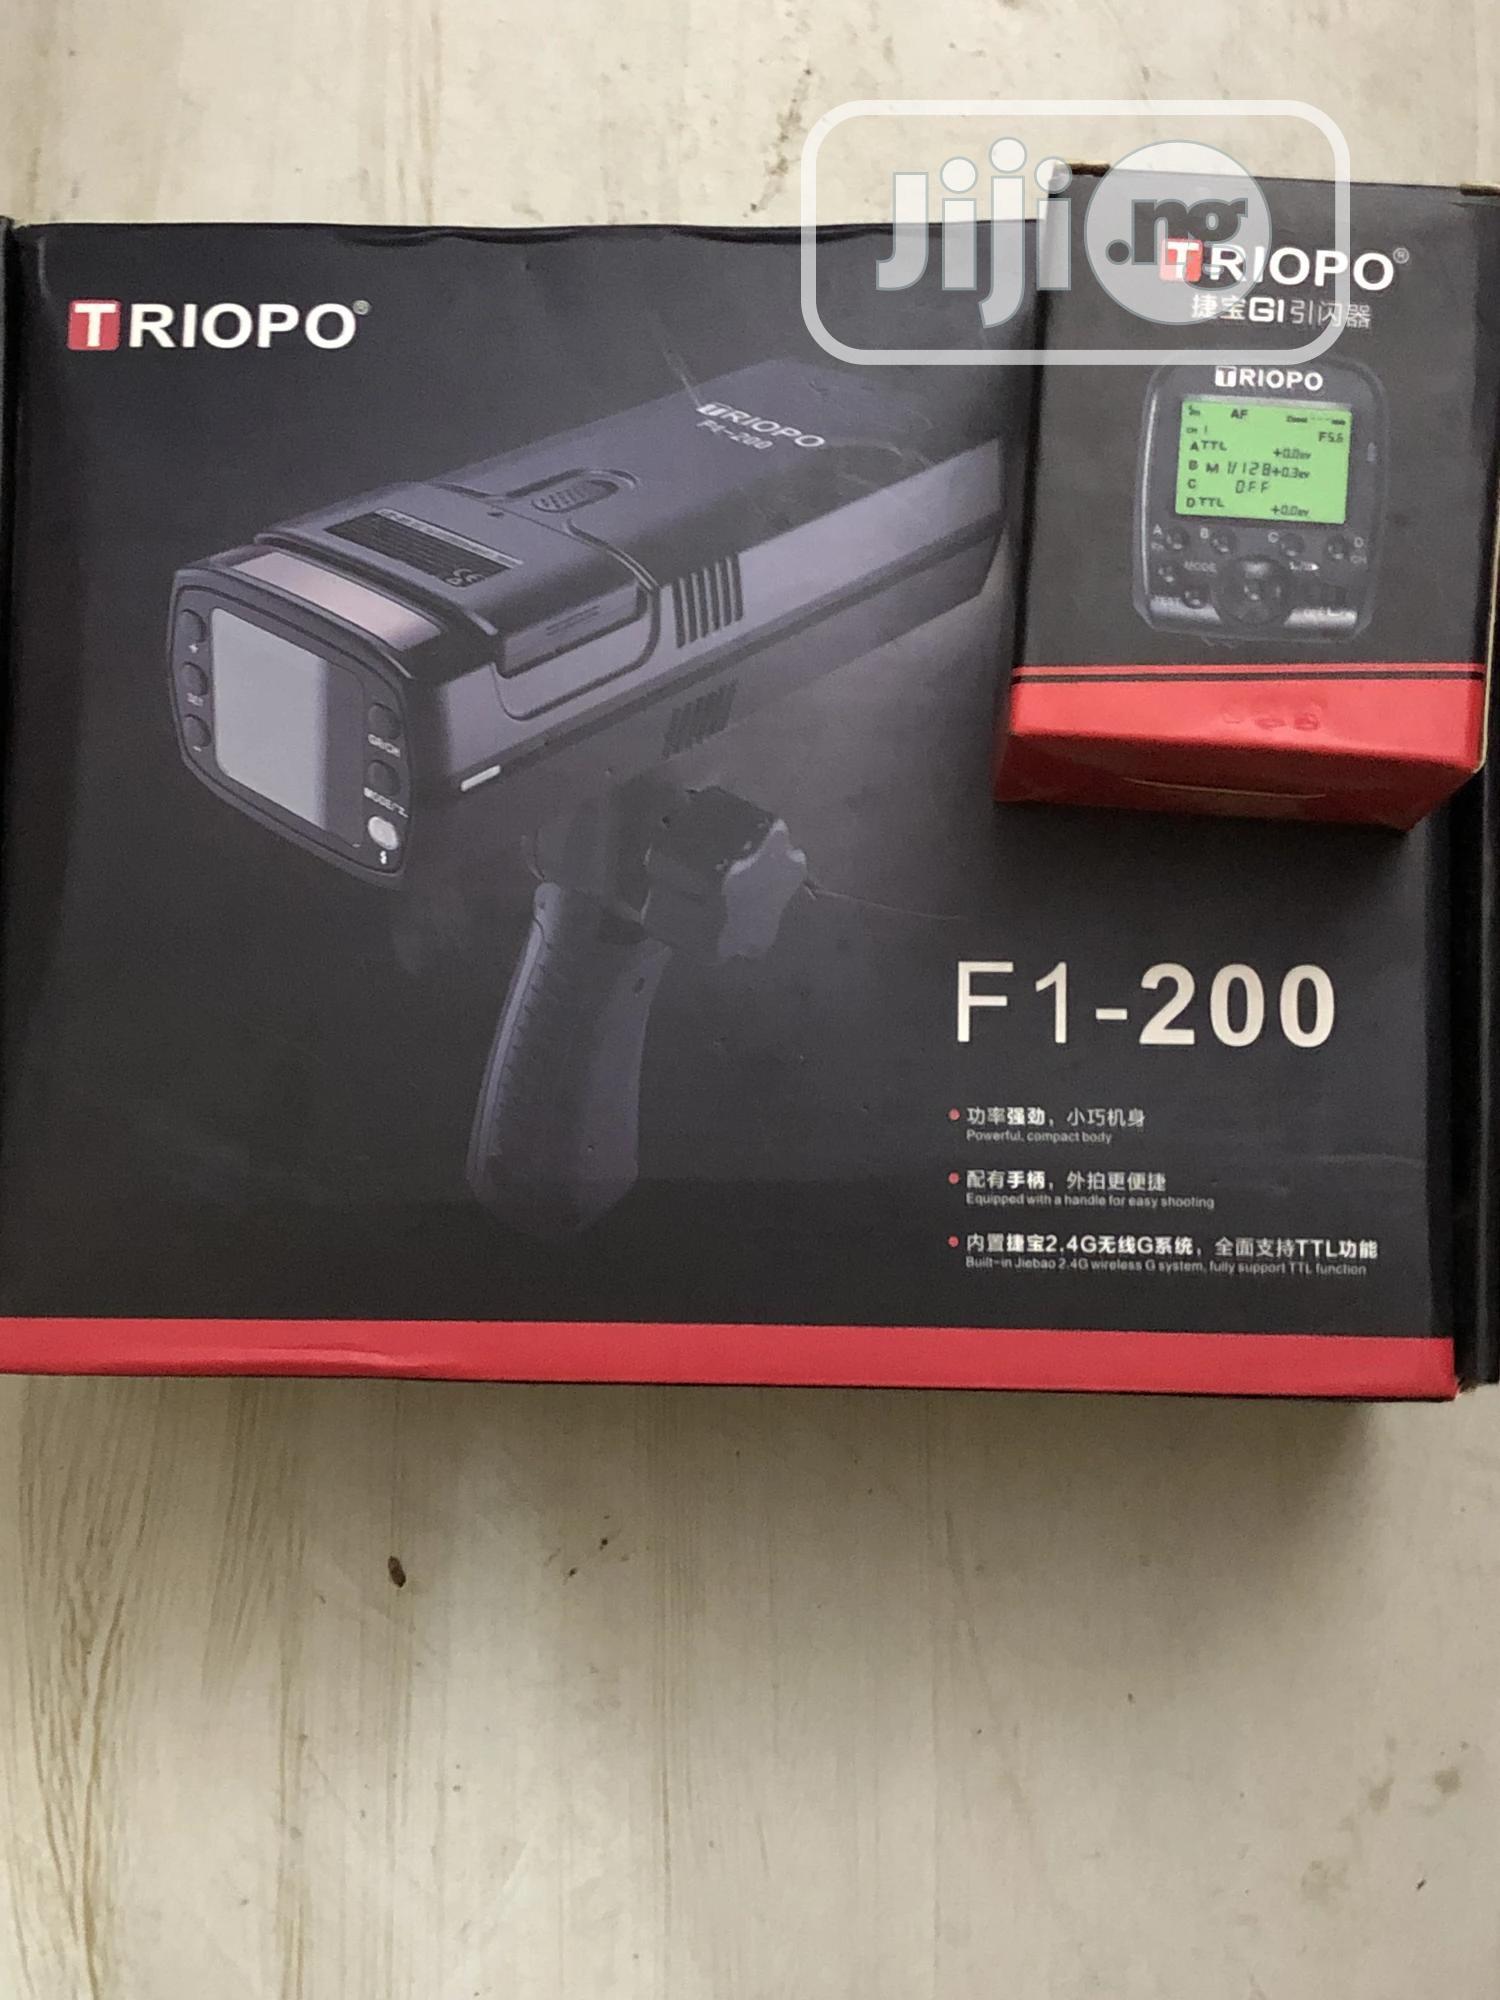 Triopo F1-200 Light